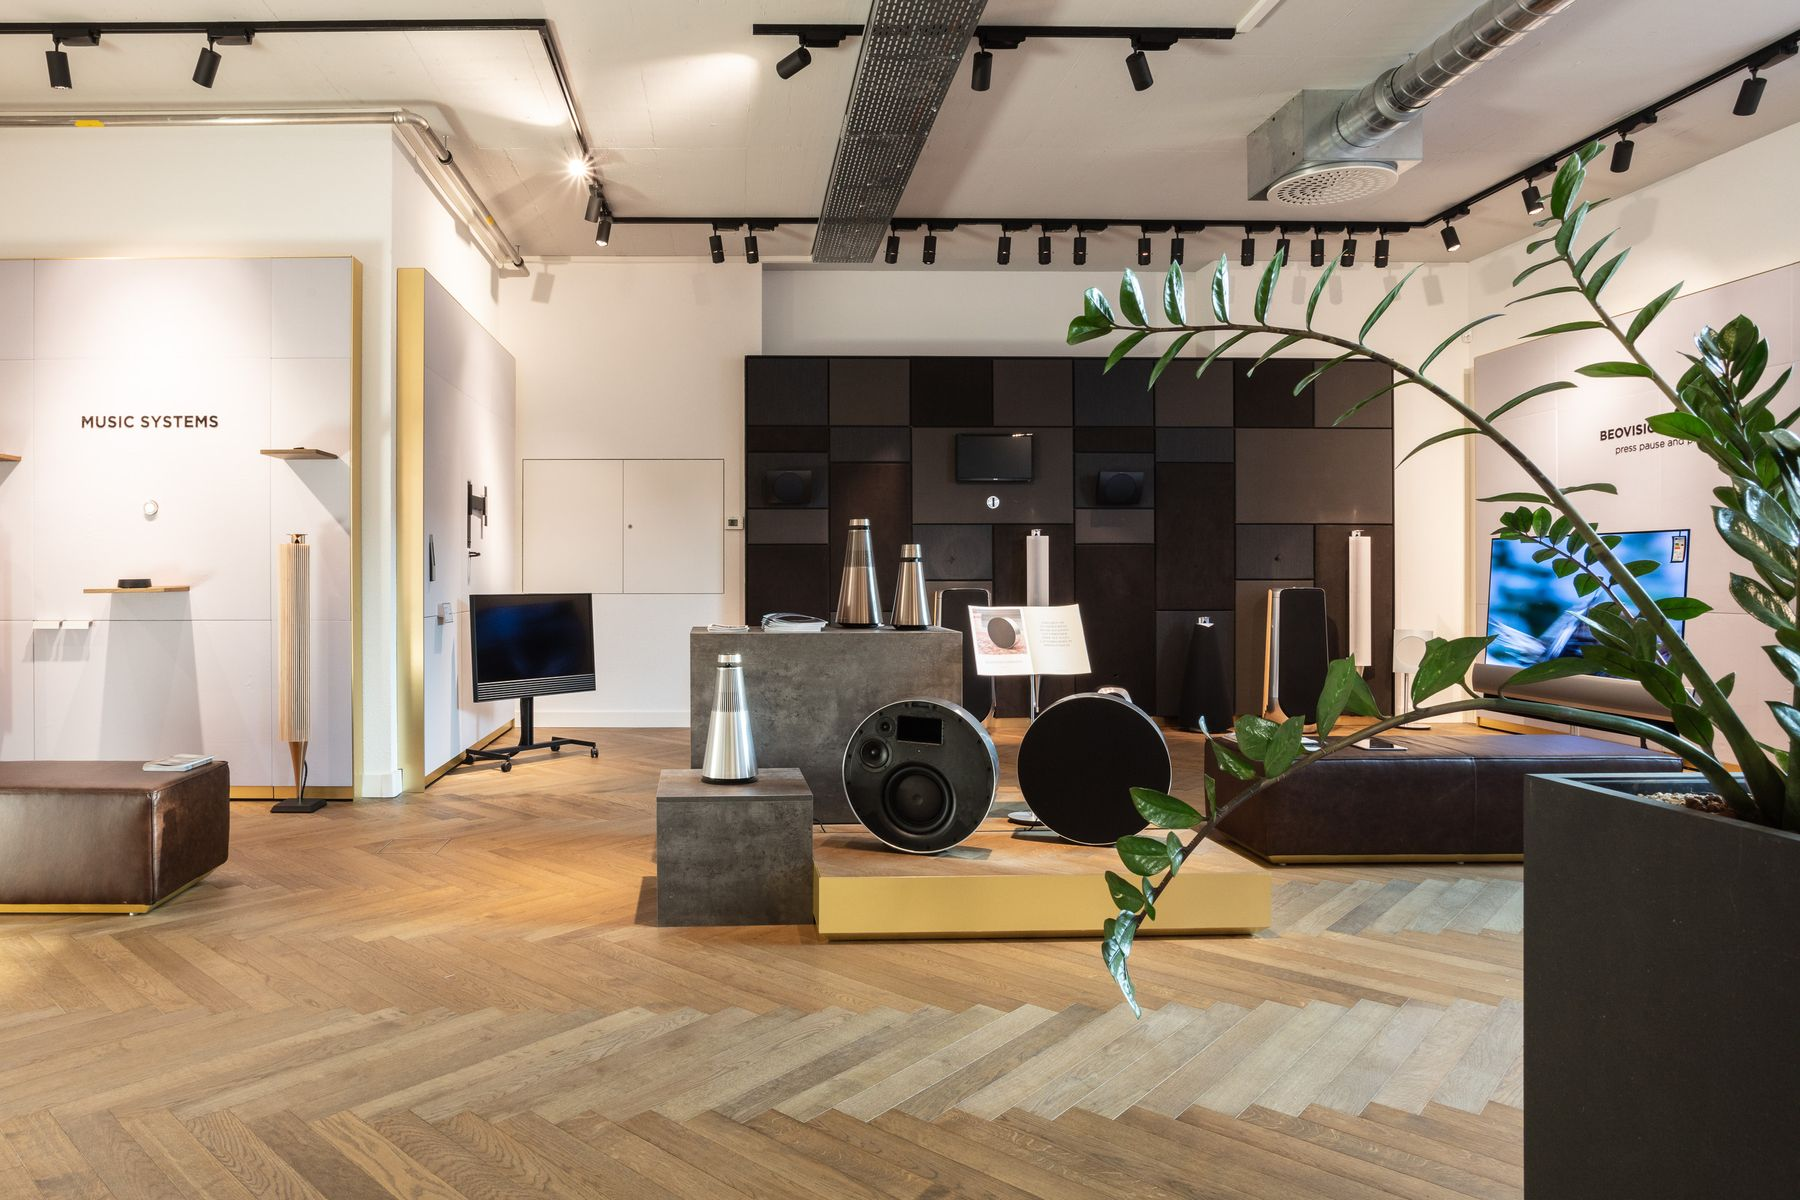 tschachtli-showroom-bundo_e4a0024